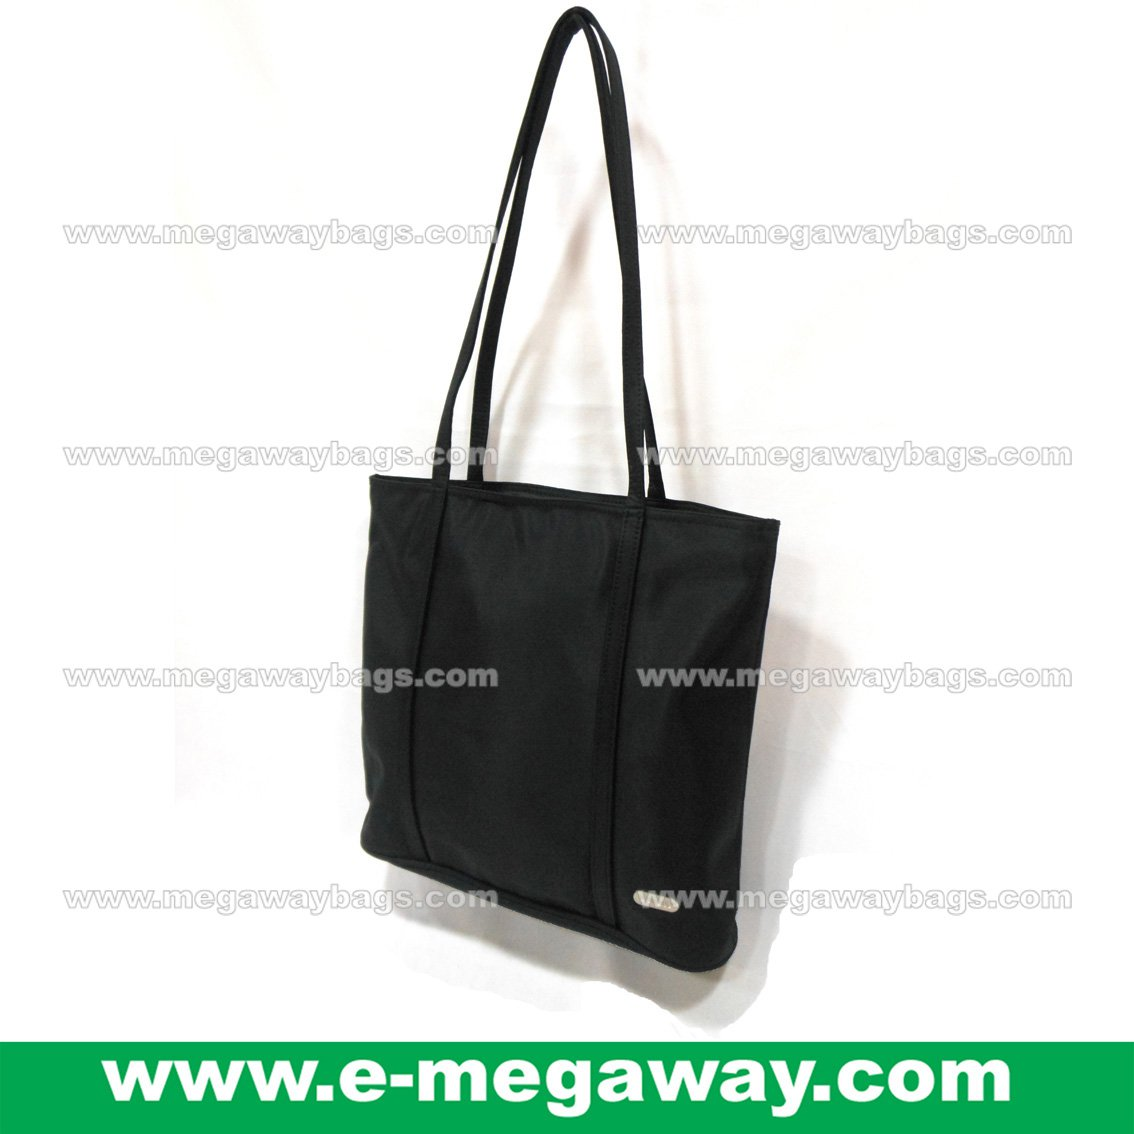 B.Young Fashion Handbag Women Handbag MegawayBags #CC- 0990